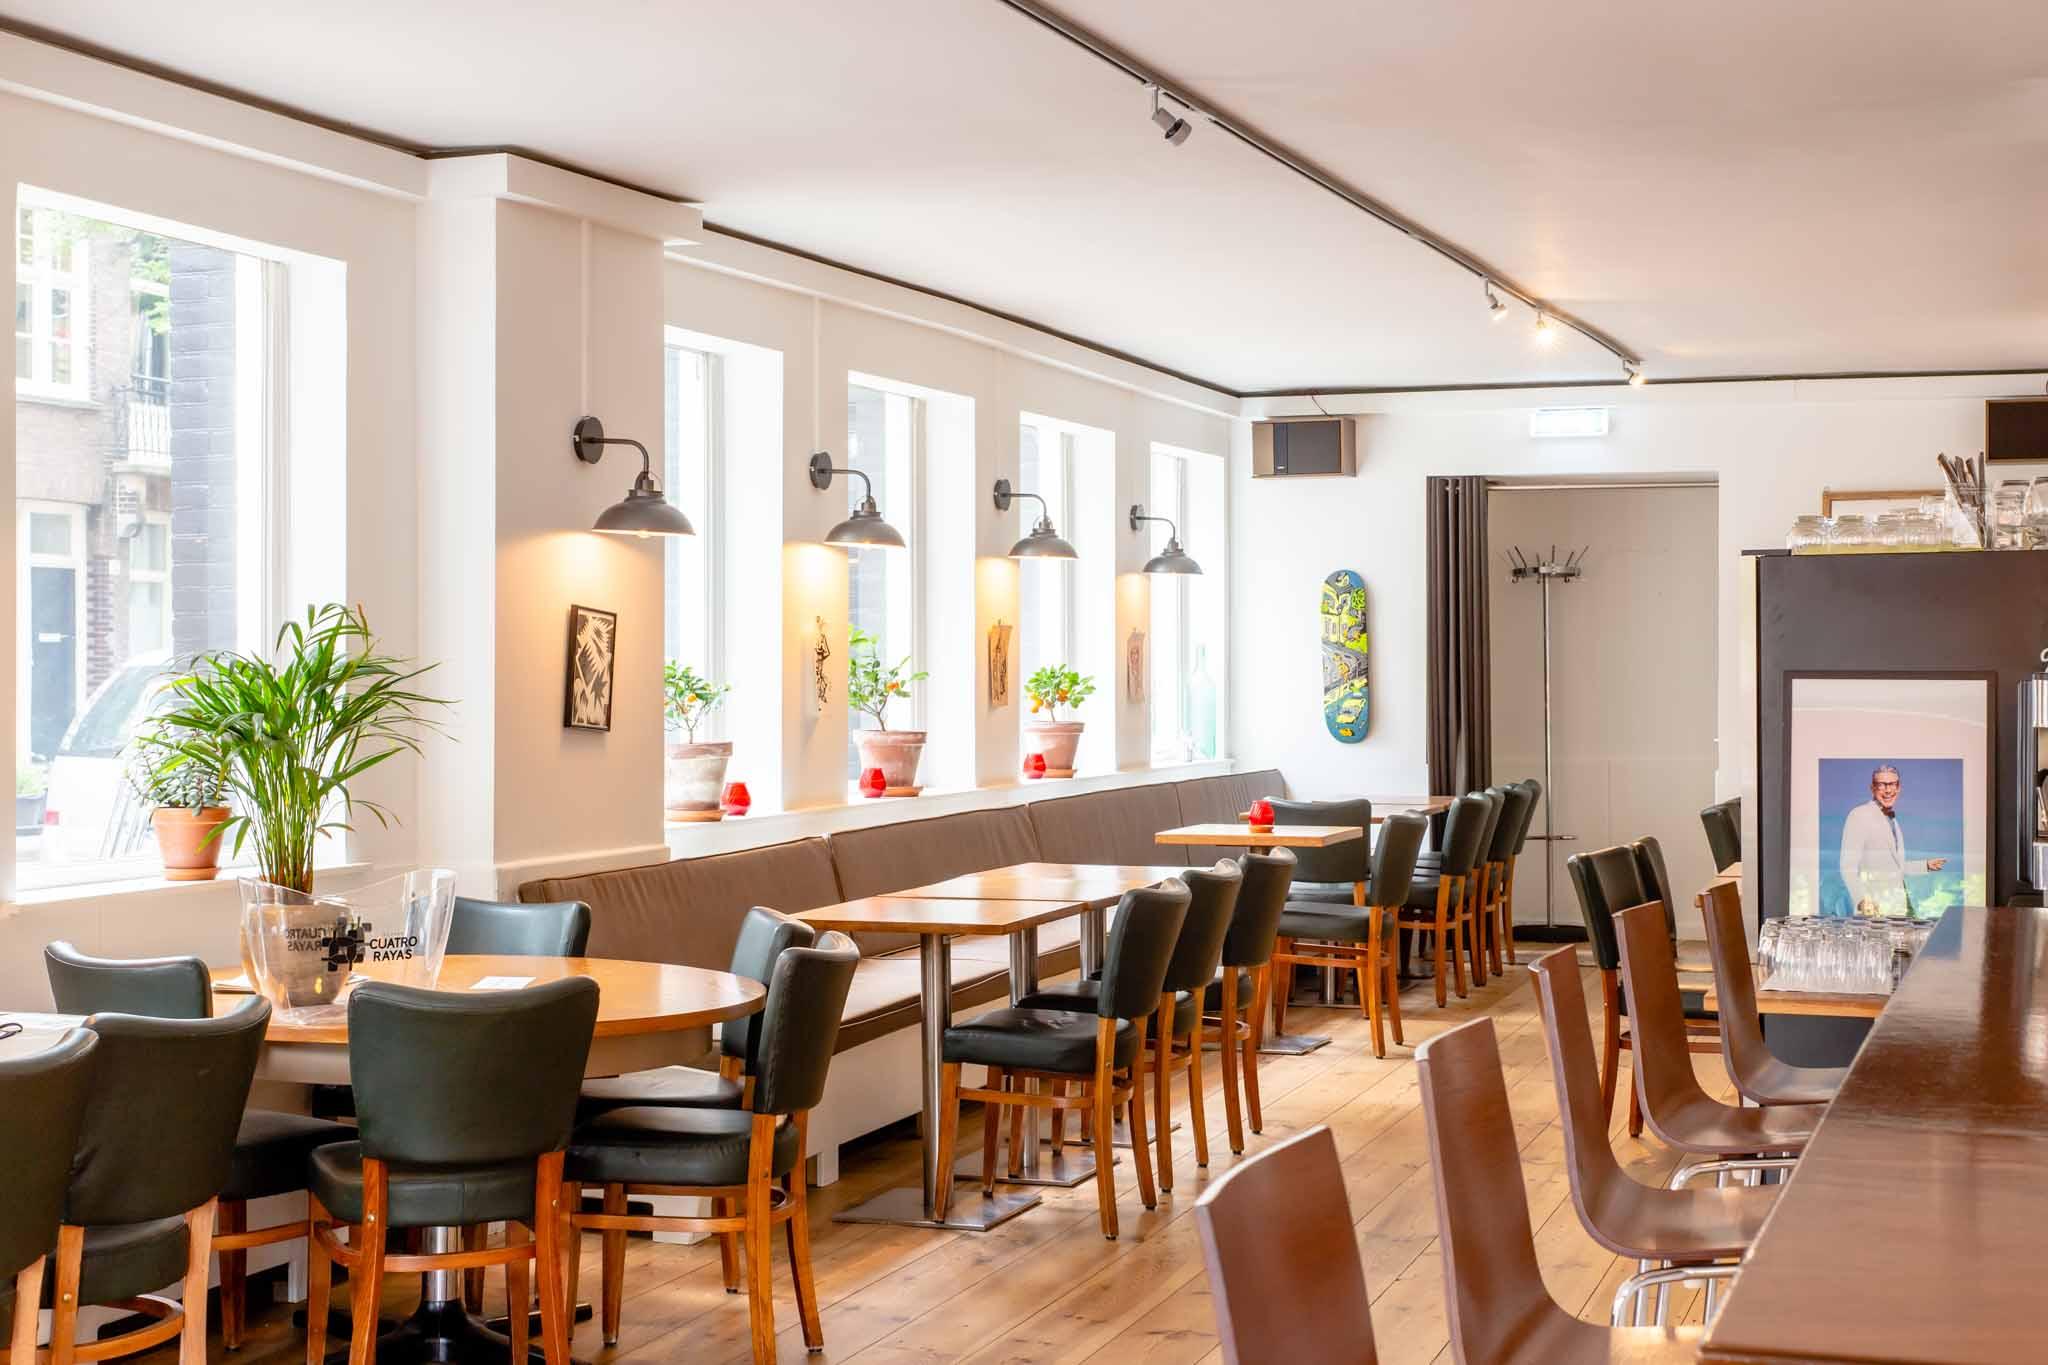 Bright interior of a cafe